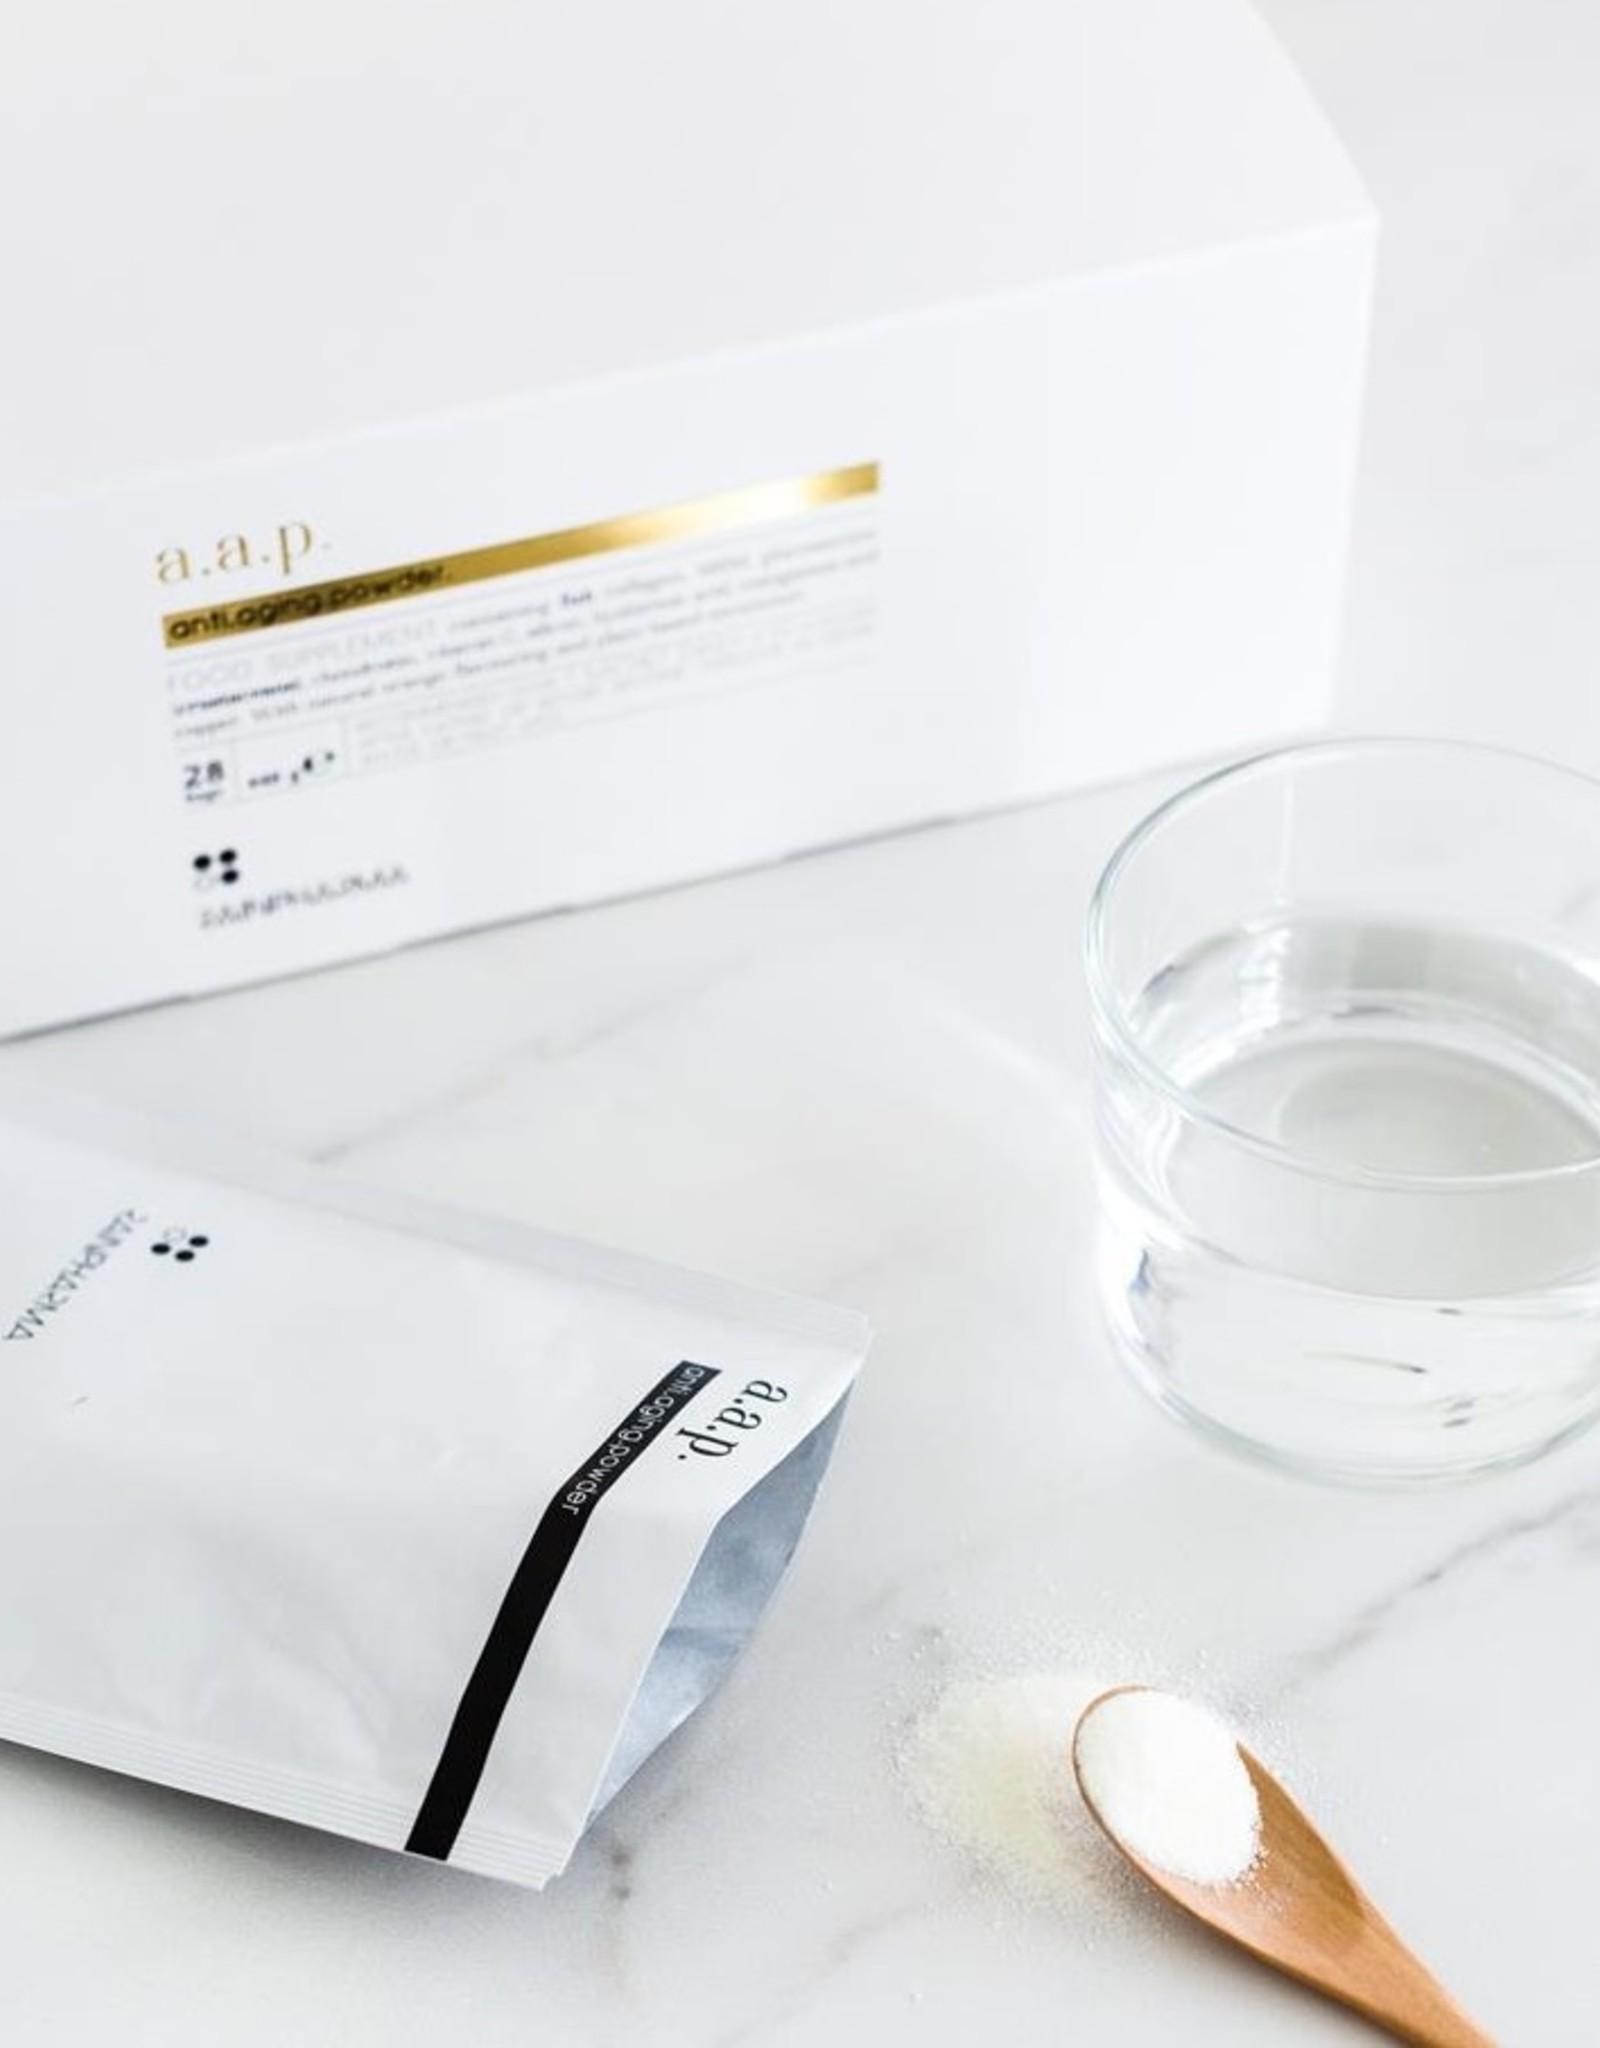 RainPharma A.A.P. Anti.aging.powder  28 Bags - Rainpharma